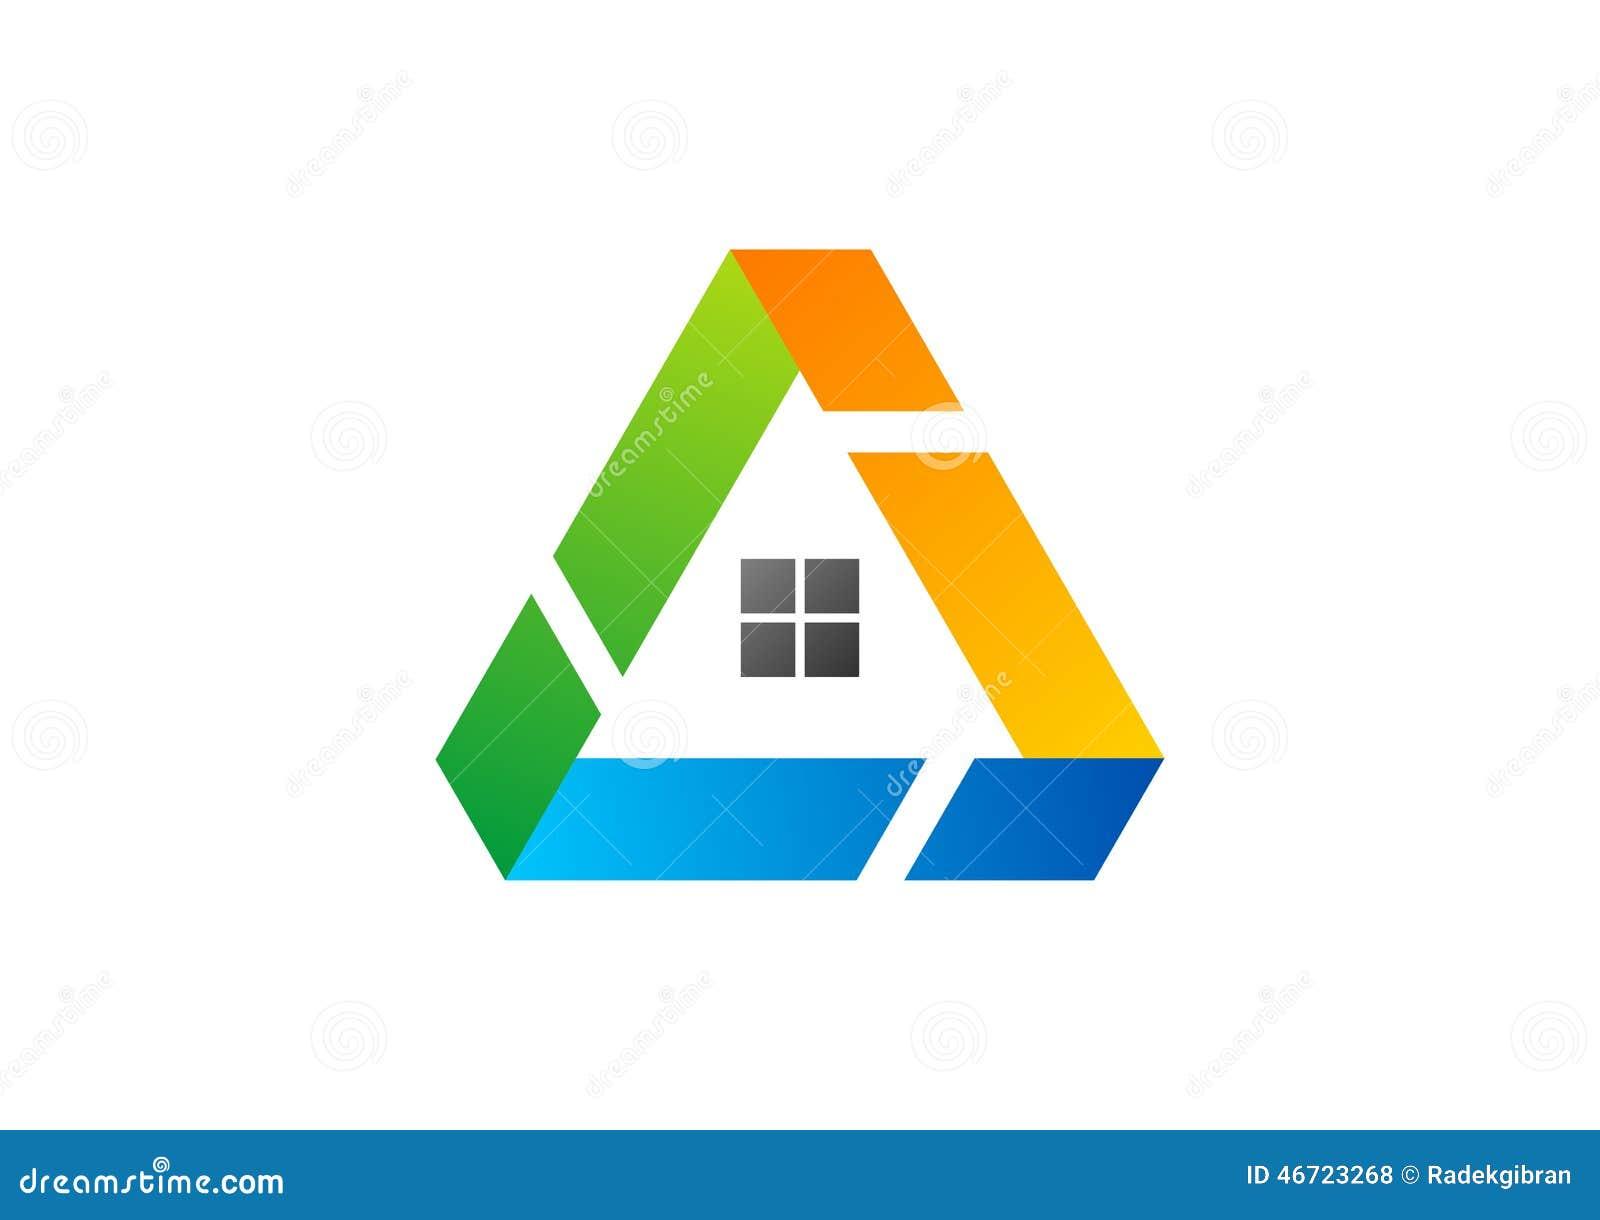 Design House Furniture Victoria House Triangle Logo Building Architecture Real Estate Home